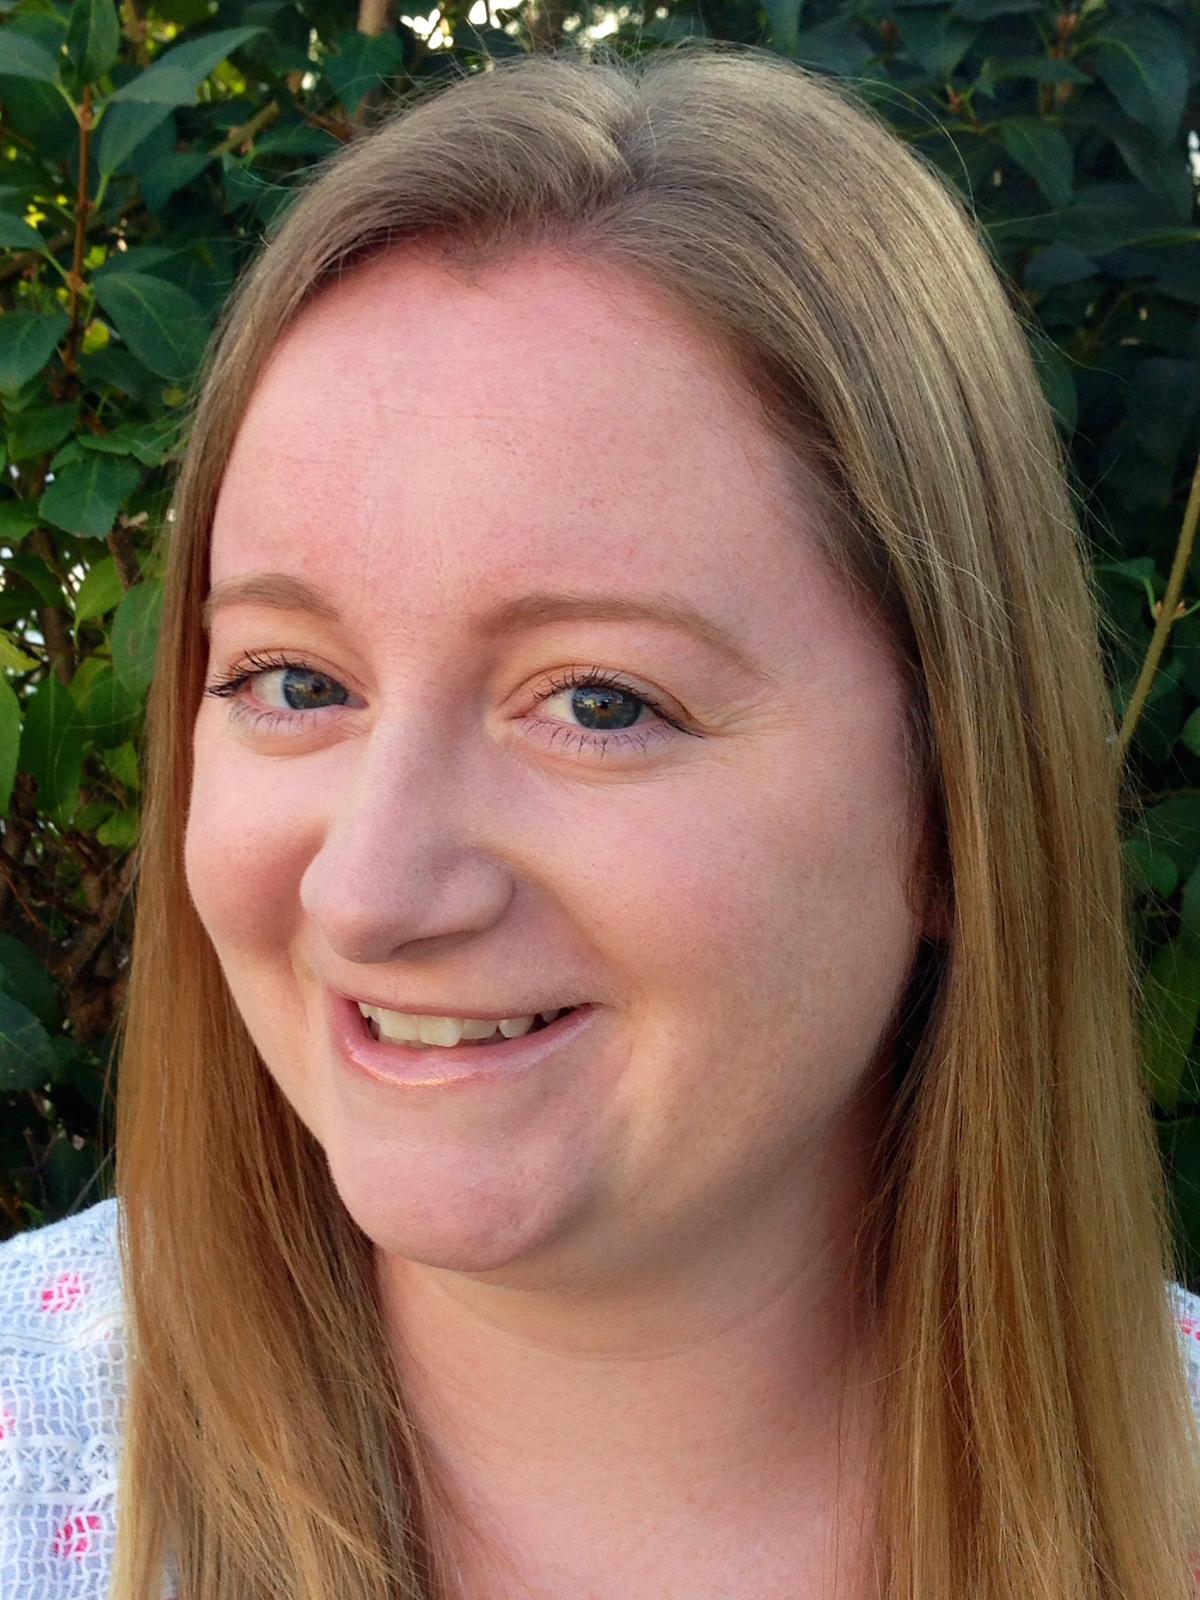 Karen Arnold-Korzeniowski, BSN, RN